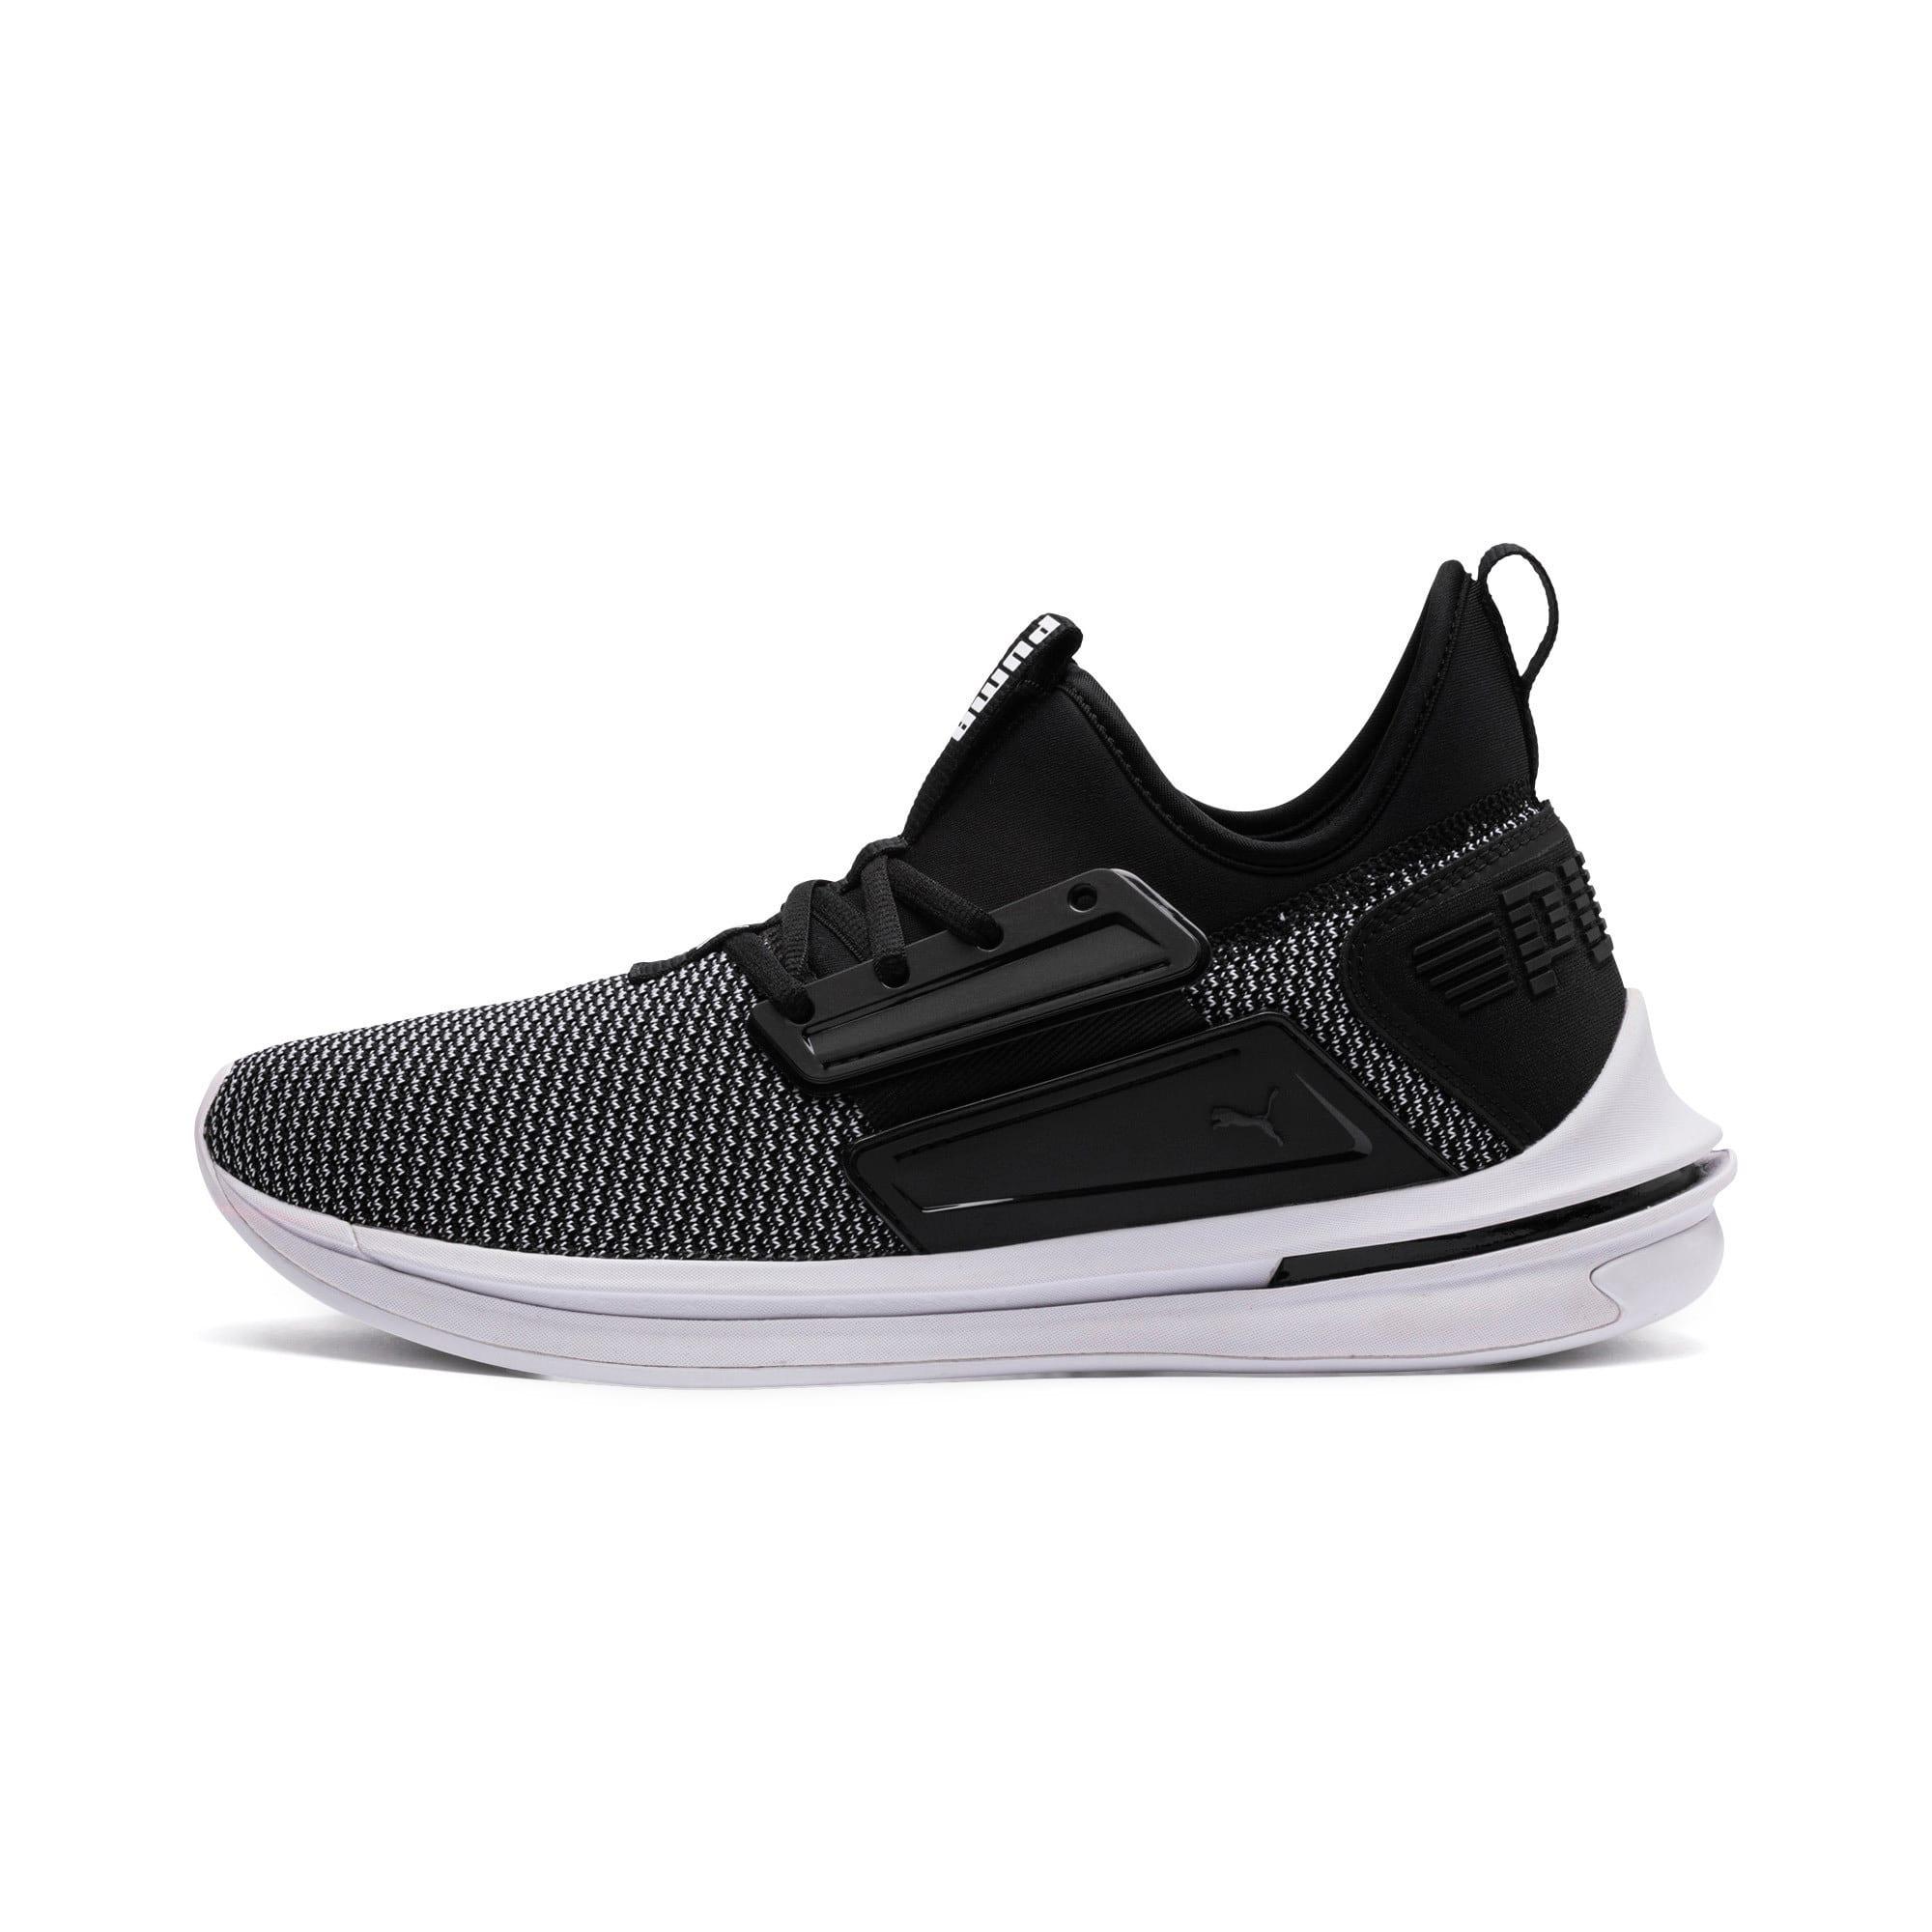 Thumbnail 1 of IGNITE Limitless SR New School Sneakers, Puma Black-Puma White, medium